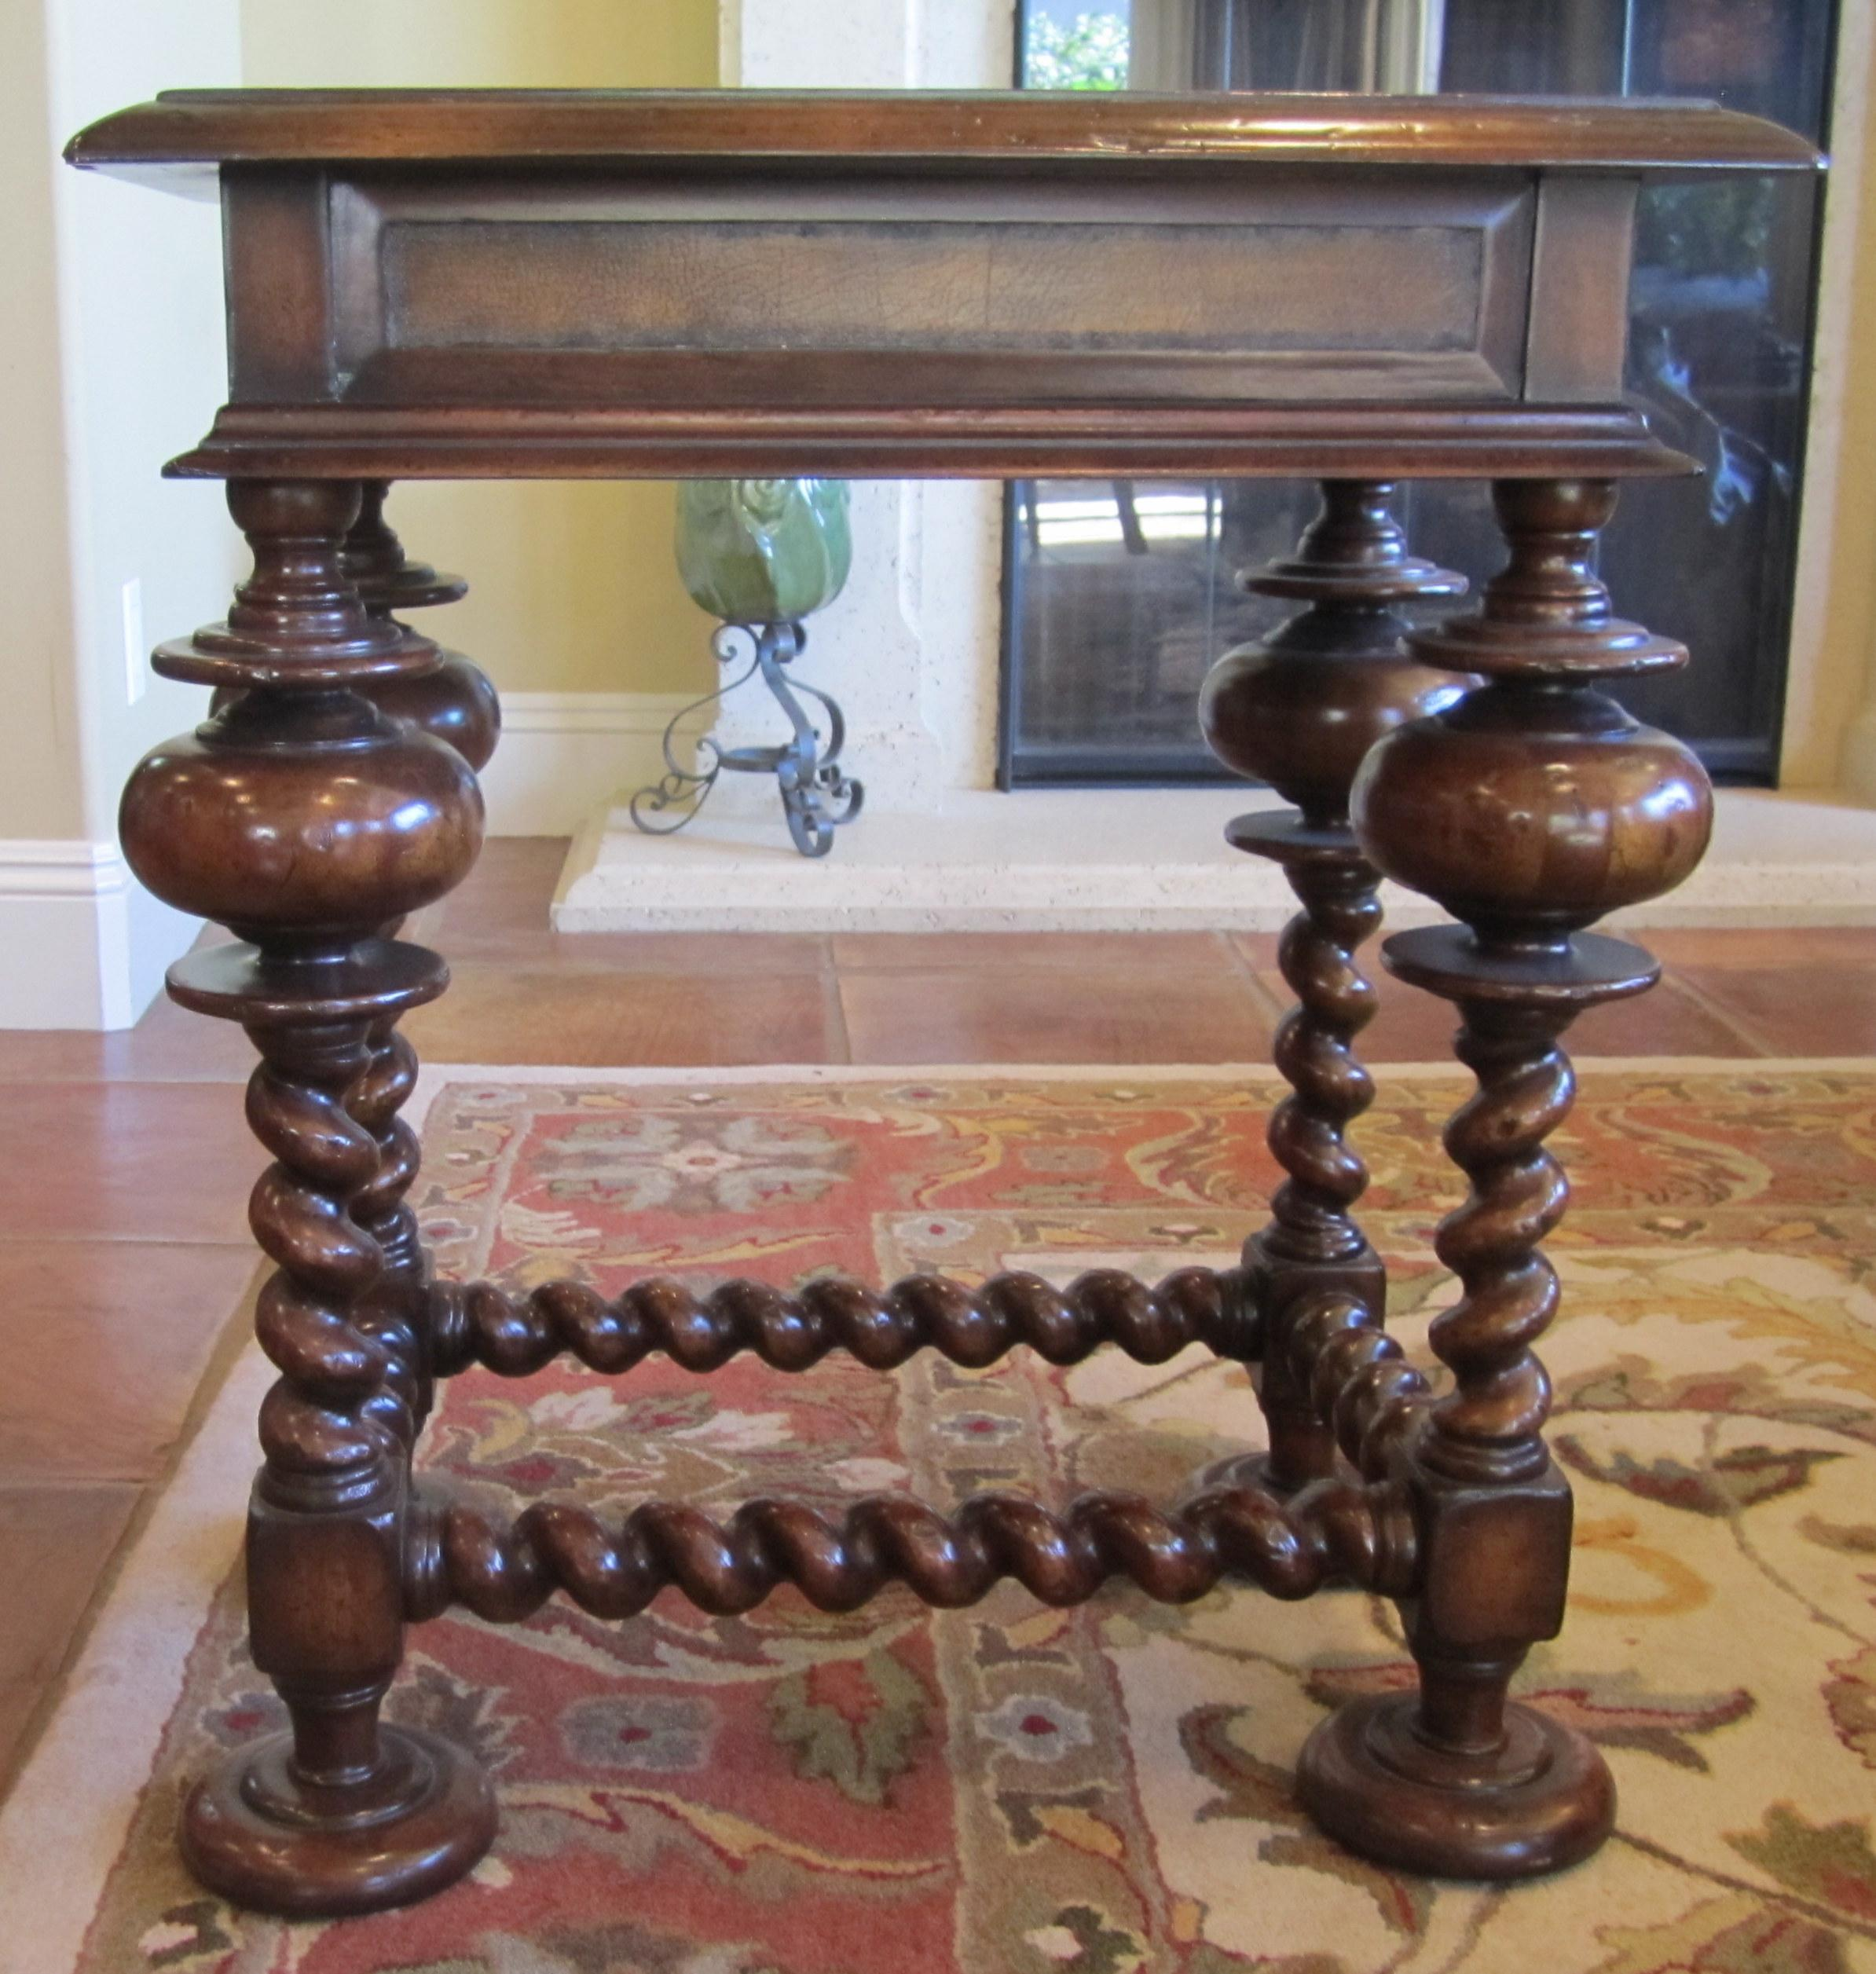 Charmant John RIchard Fine Furniture Leather Inlay U0026 Turned Leg Wood Side Table    Image 2 Of